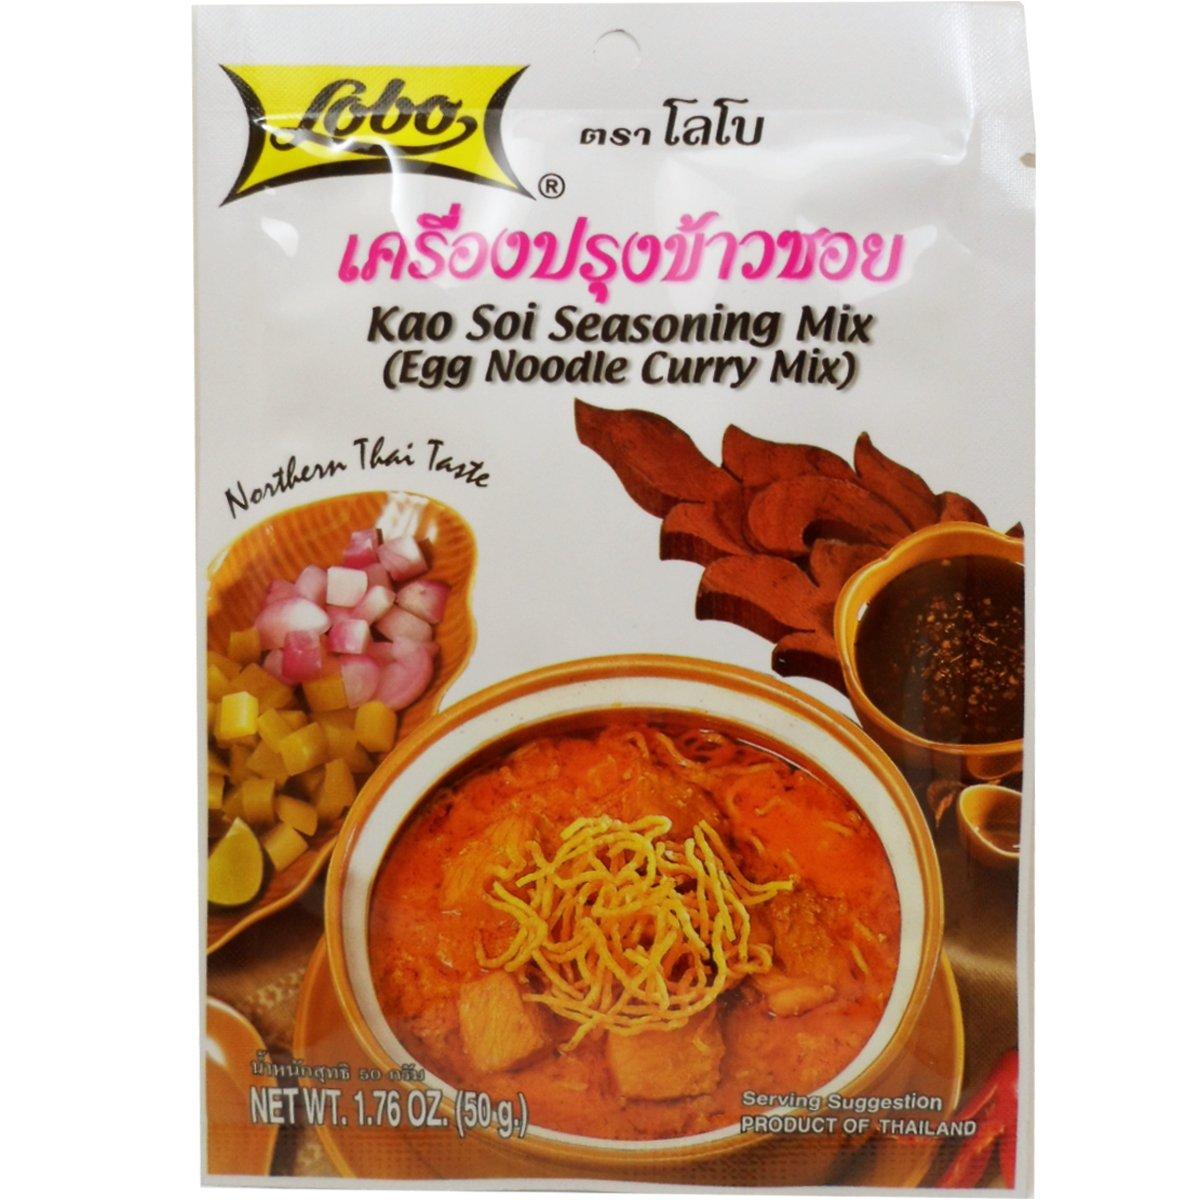 Lobo Kao Soi Seasoning Mix (Egg Noodle Curry Mix) Thai Herbal Food Net Wt 50g (1.76 Oz) X 5 Bags